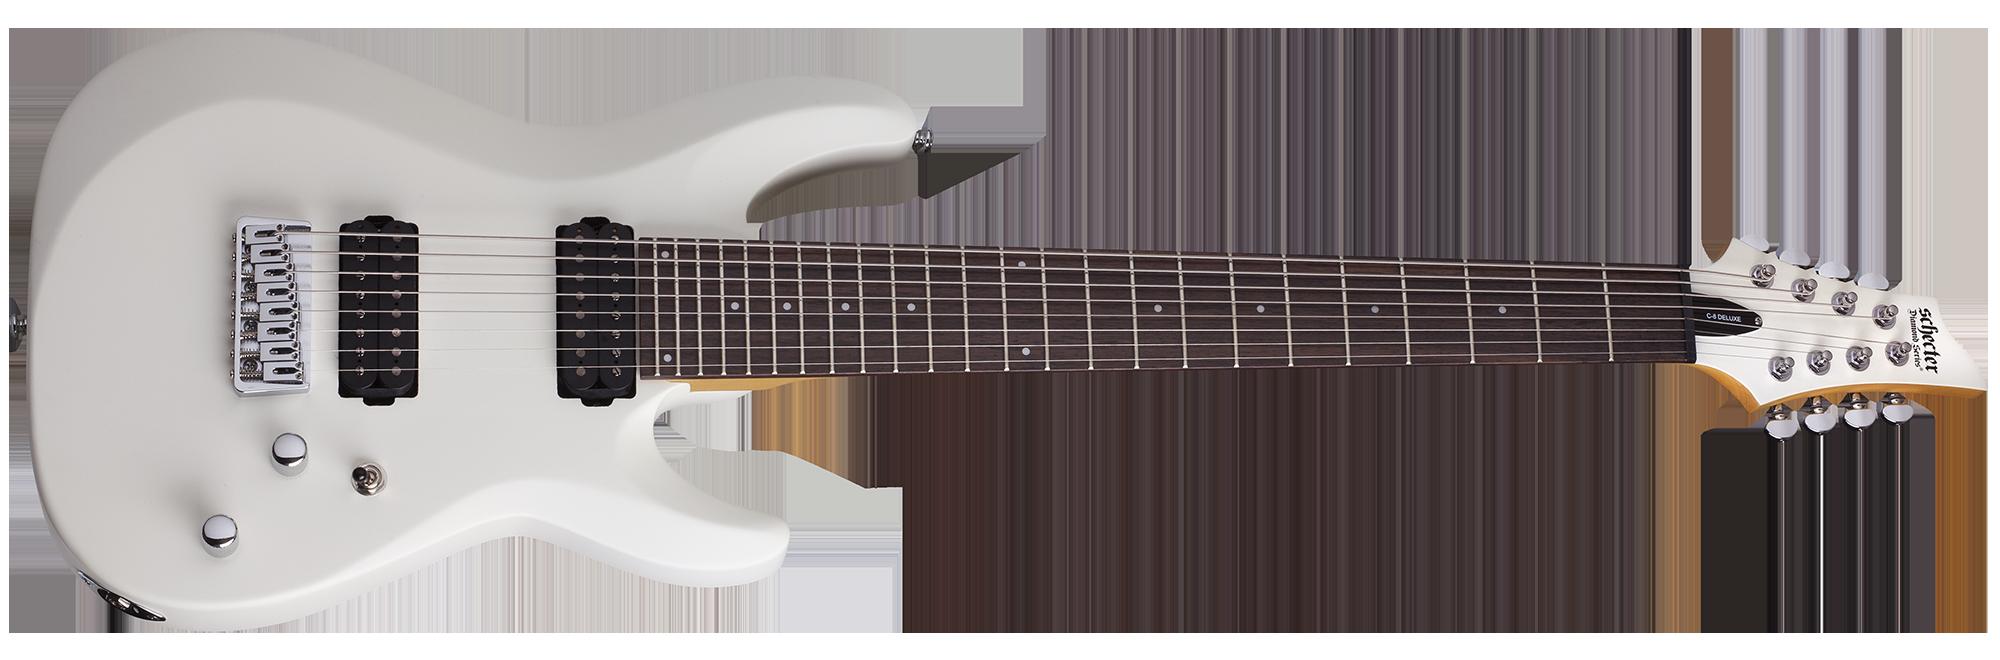 C-8 Deluxe Satin White (SWHT) SKU #441